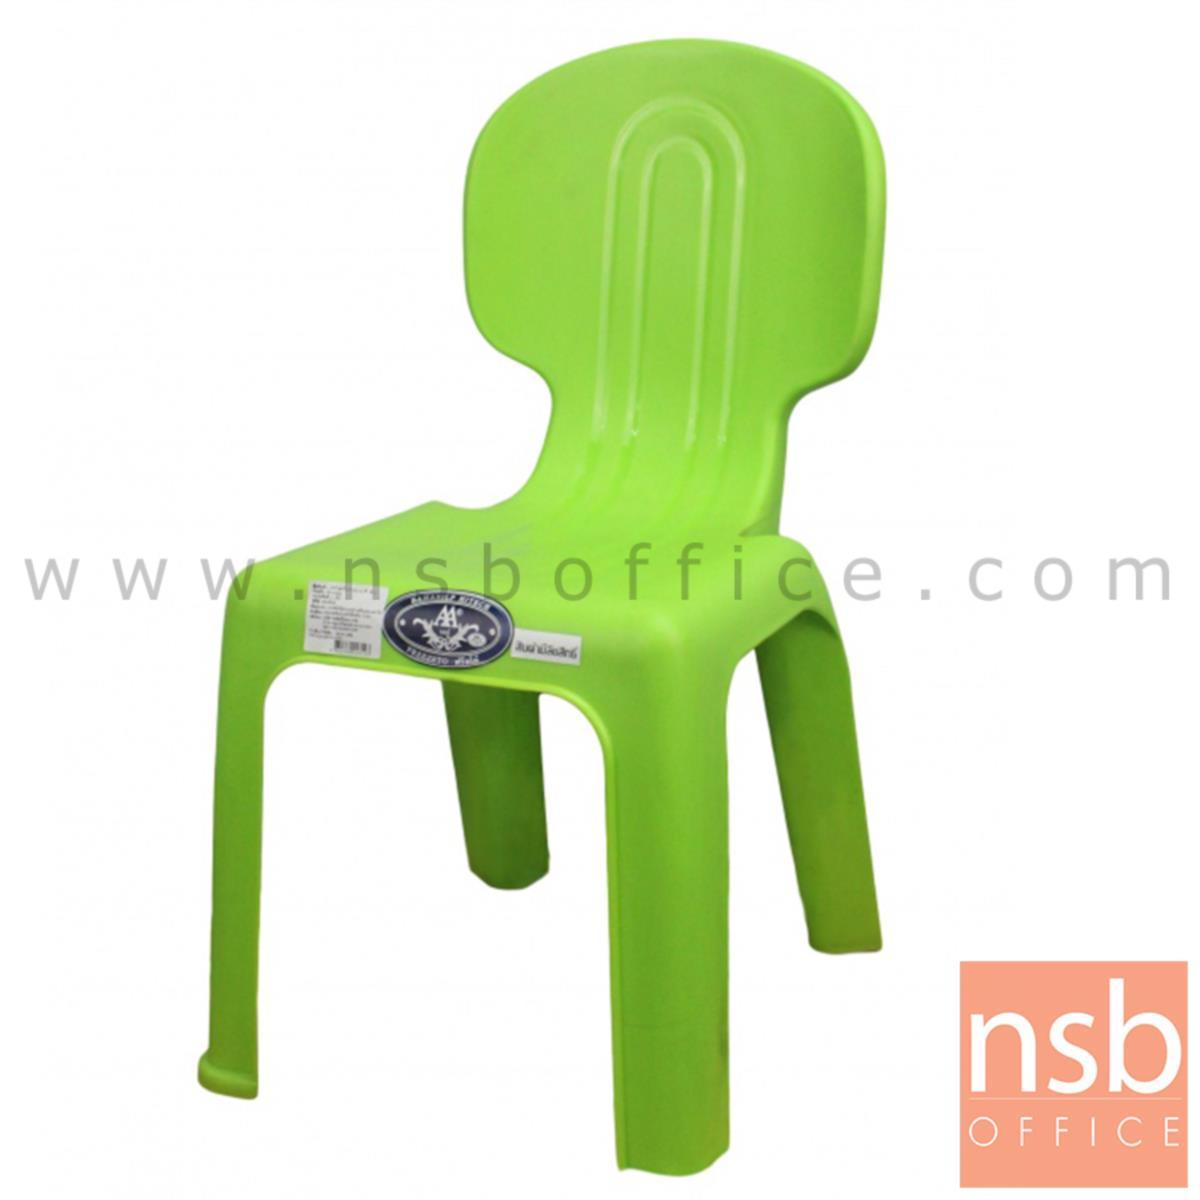 B10A070:เก้าอี้พลาสติกสำหรับเด็ก รุ่น FURKY_CHAIR (ผลิตทั้งเกรด A และ B)